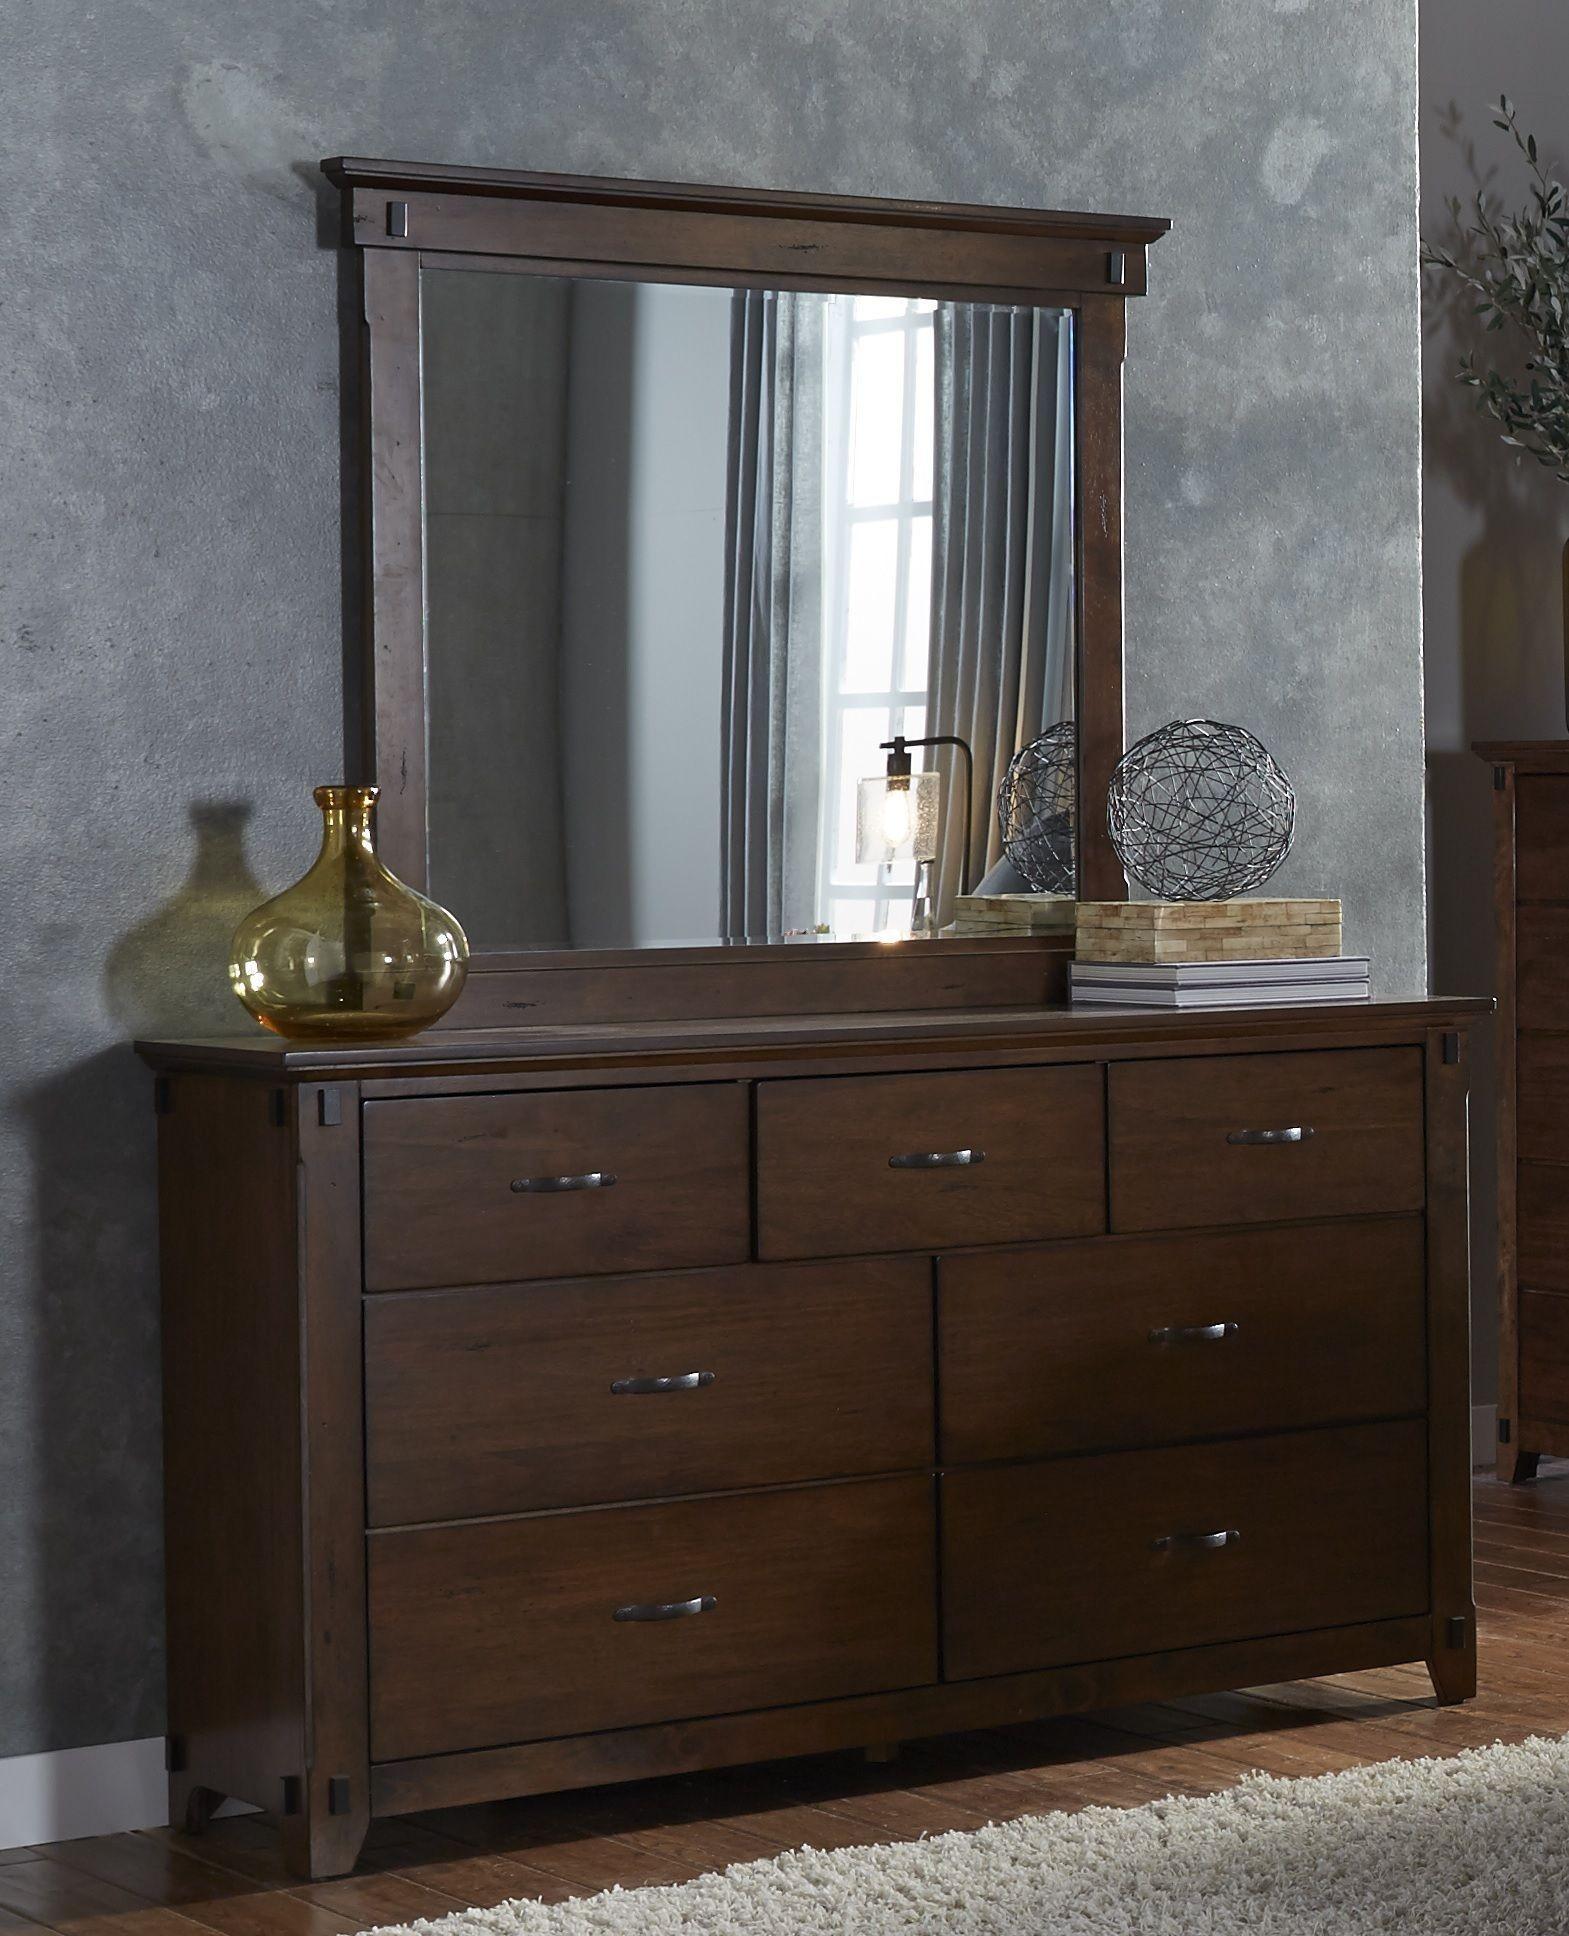 Ridgefield saddle drawer dresser mirror from progressive